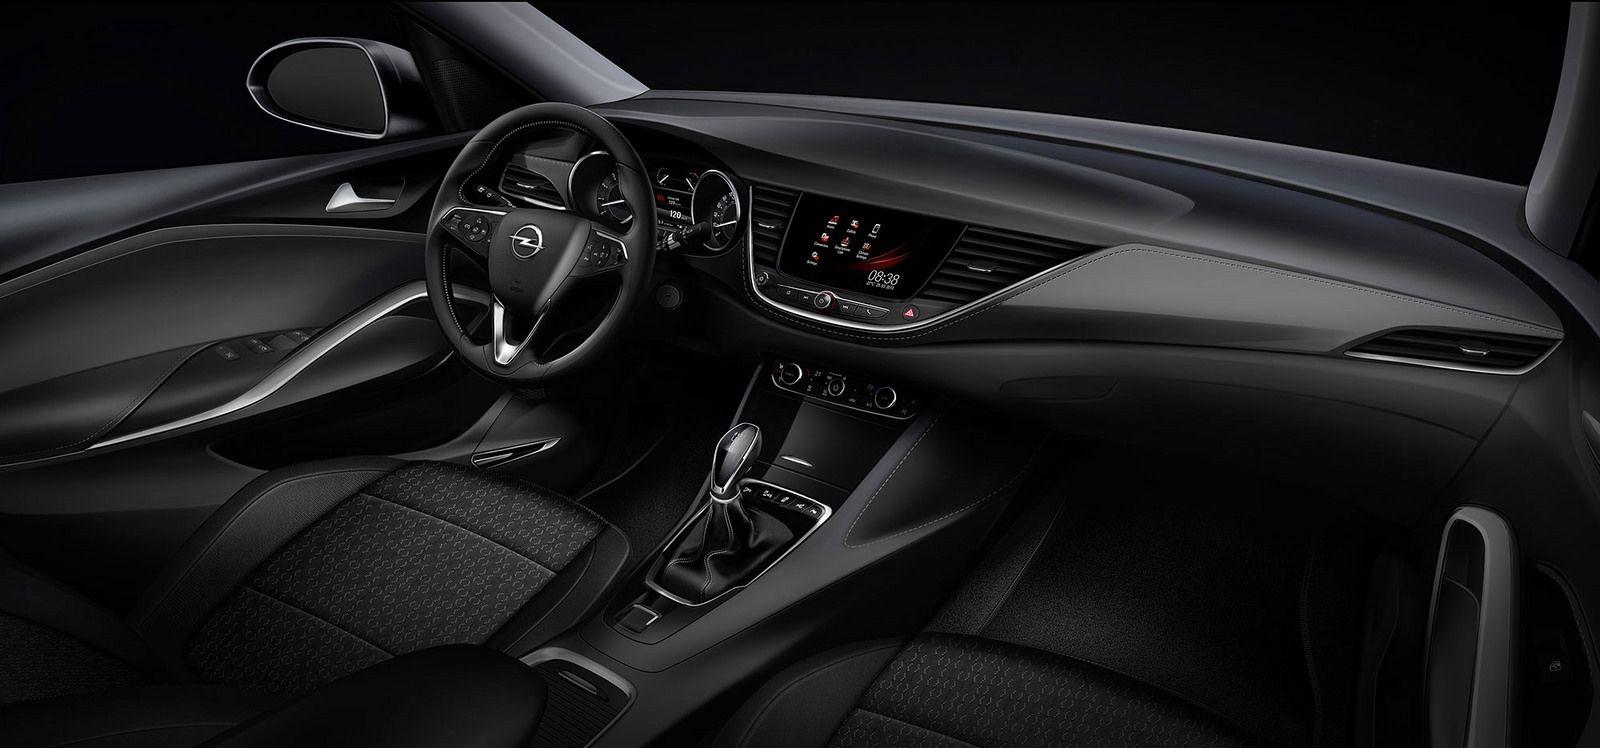 Opel Grandland X Interior Design Car Interior Sketch Design Interior Sketch